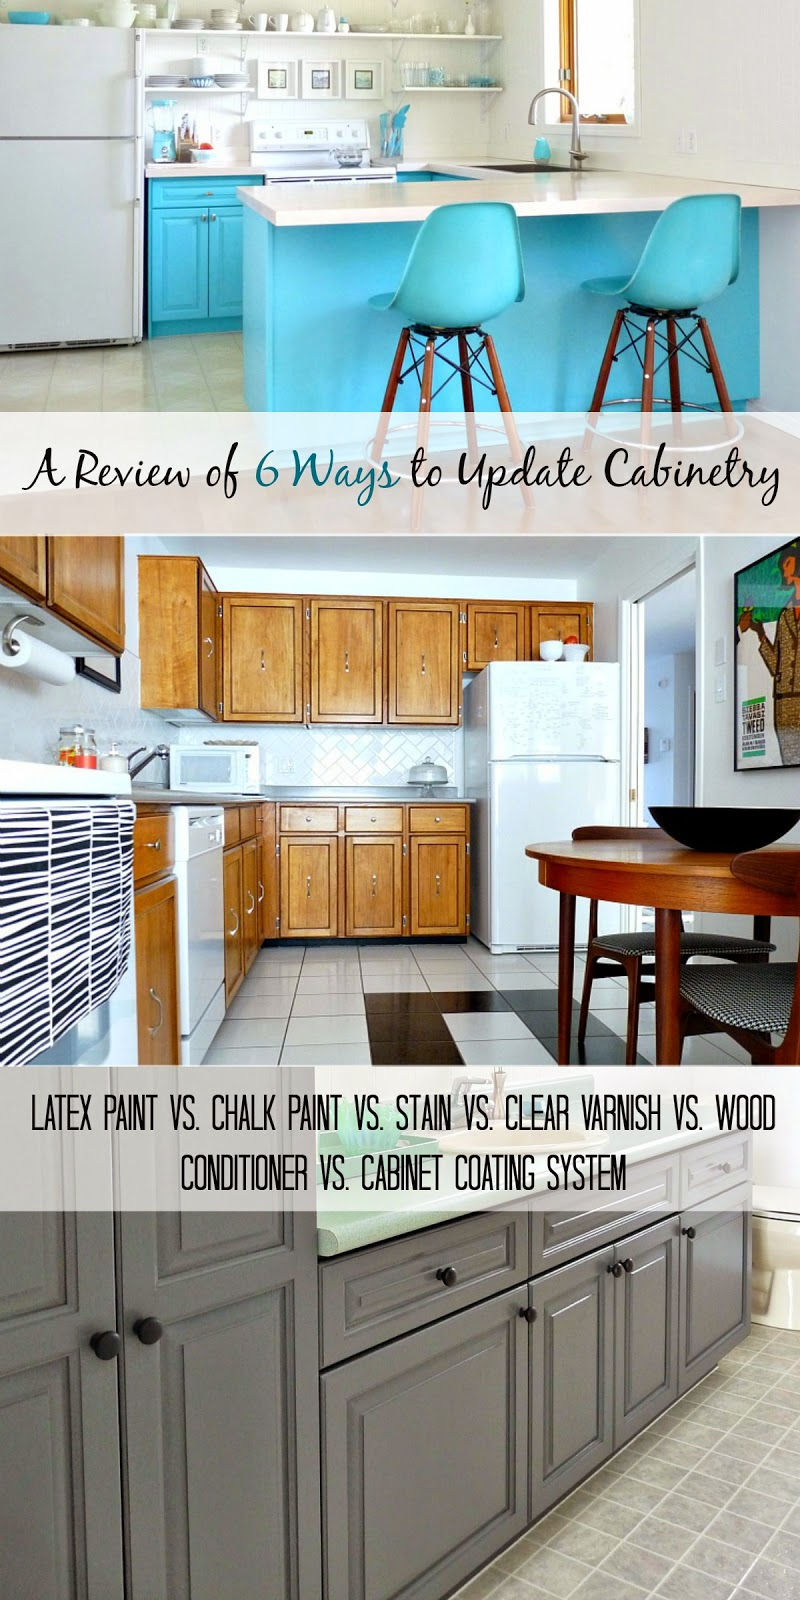 cabinet refinishing paint vs stain vs cabinet coating